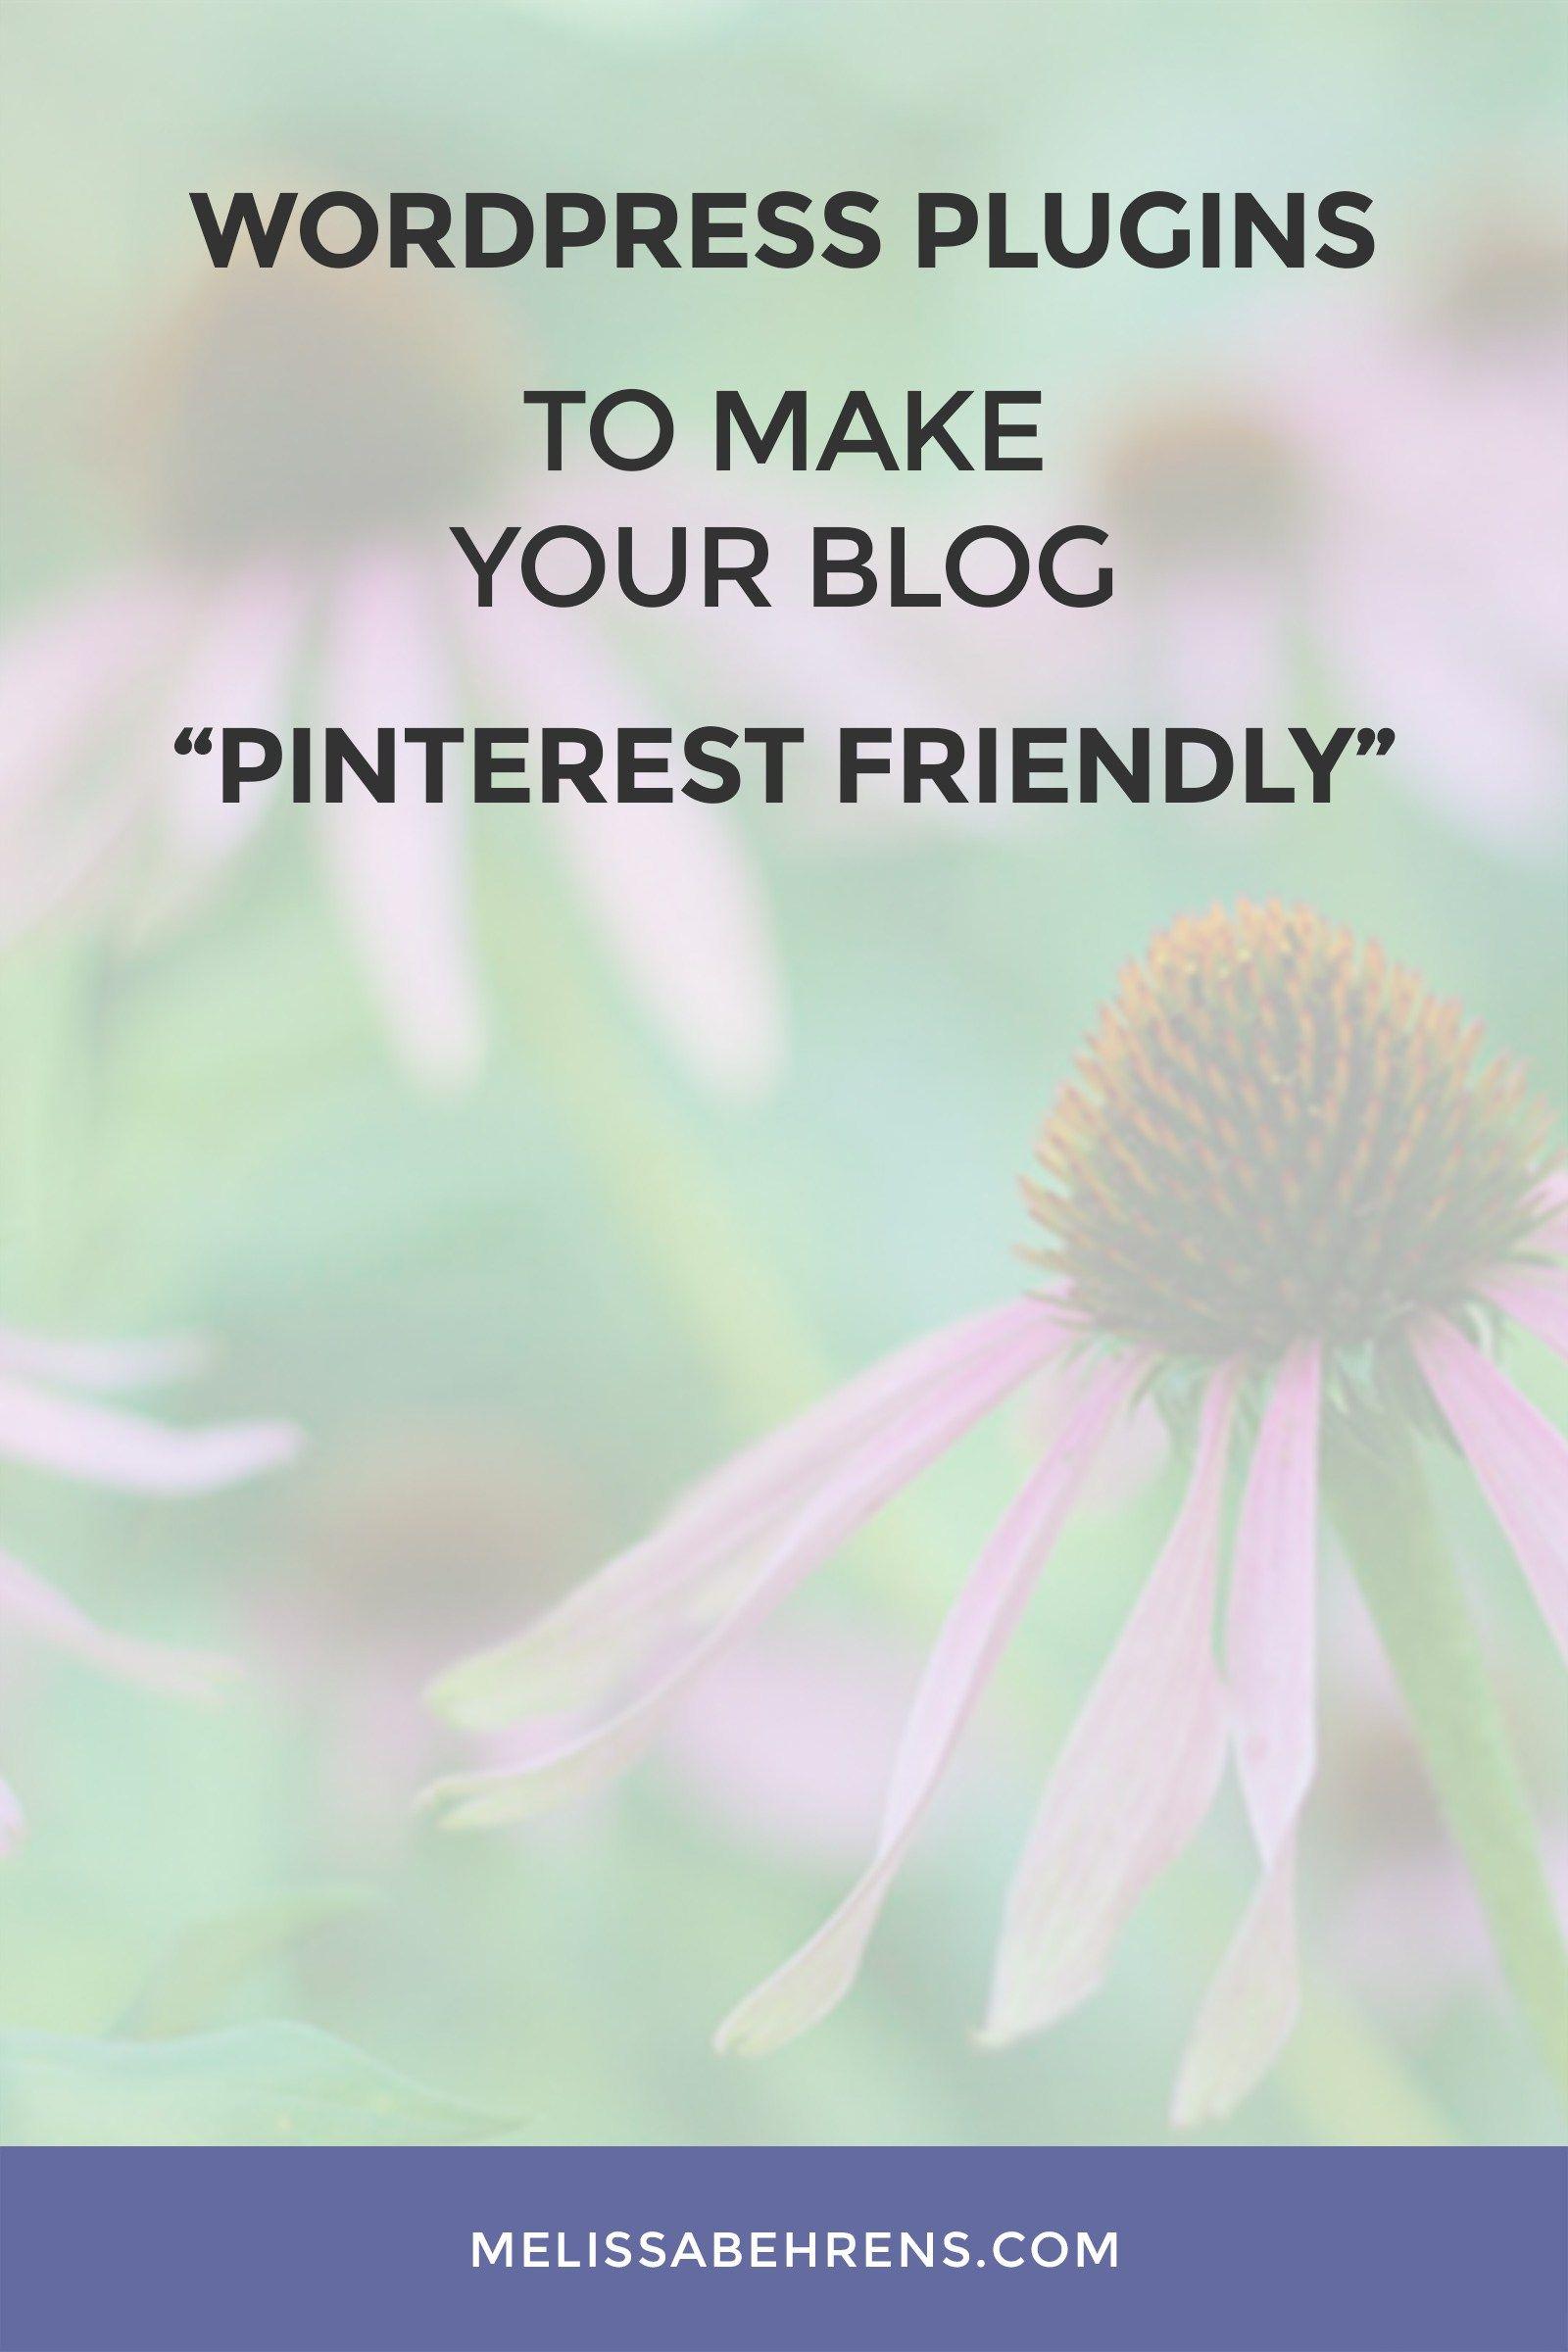 Wordpress Plugins to Make Your Blog Pinterest Friendly